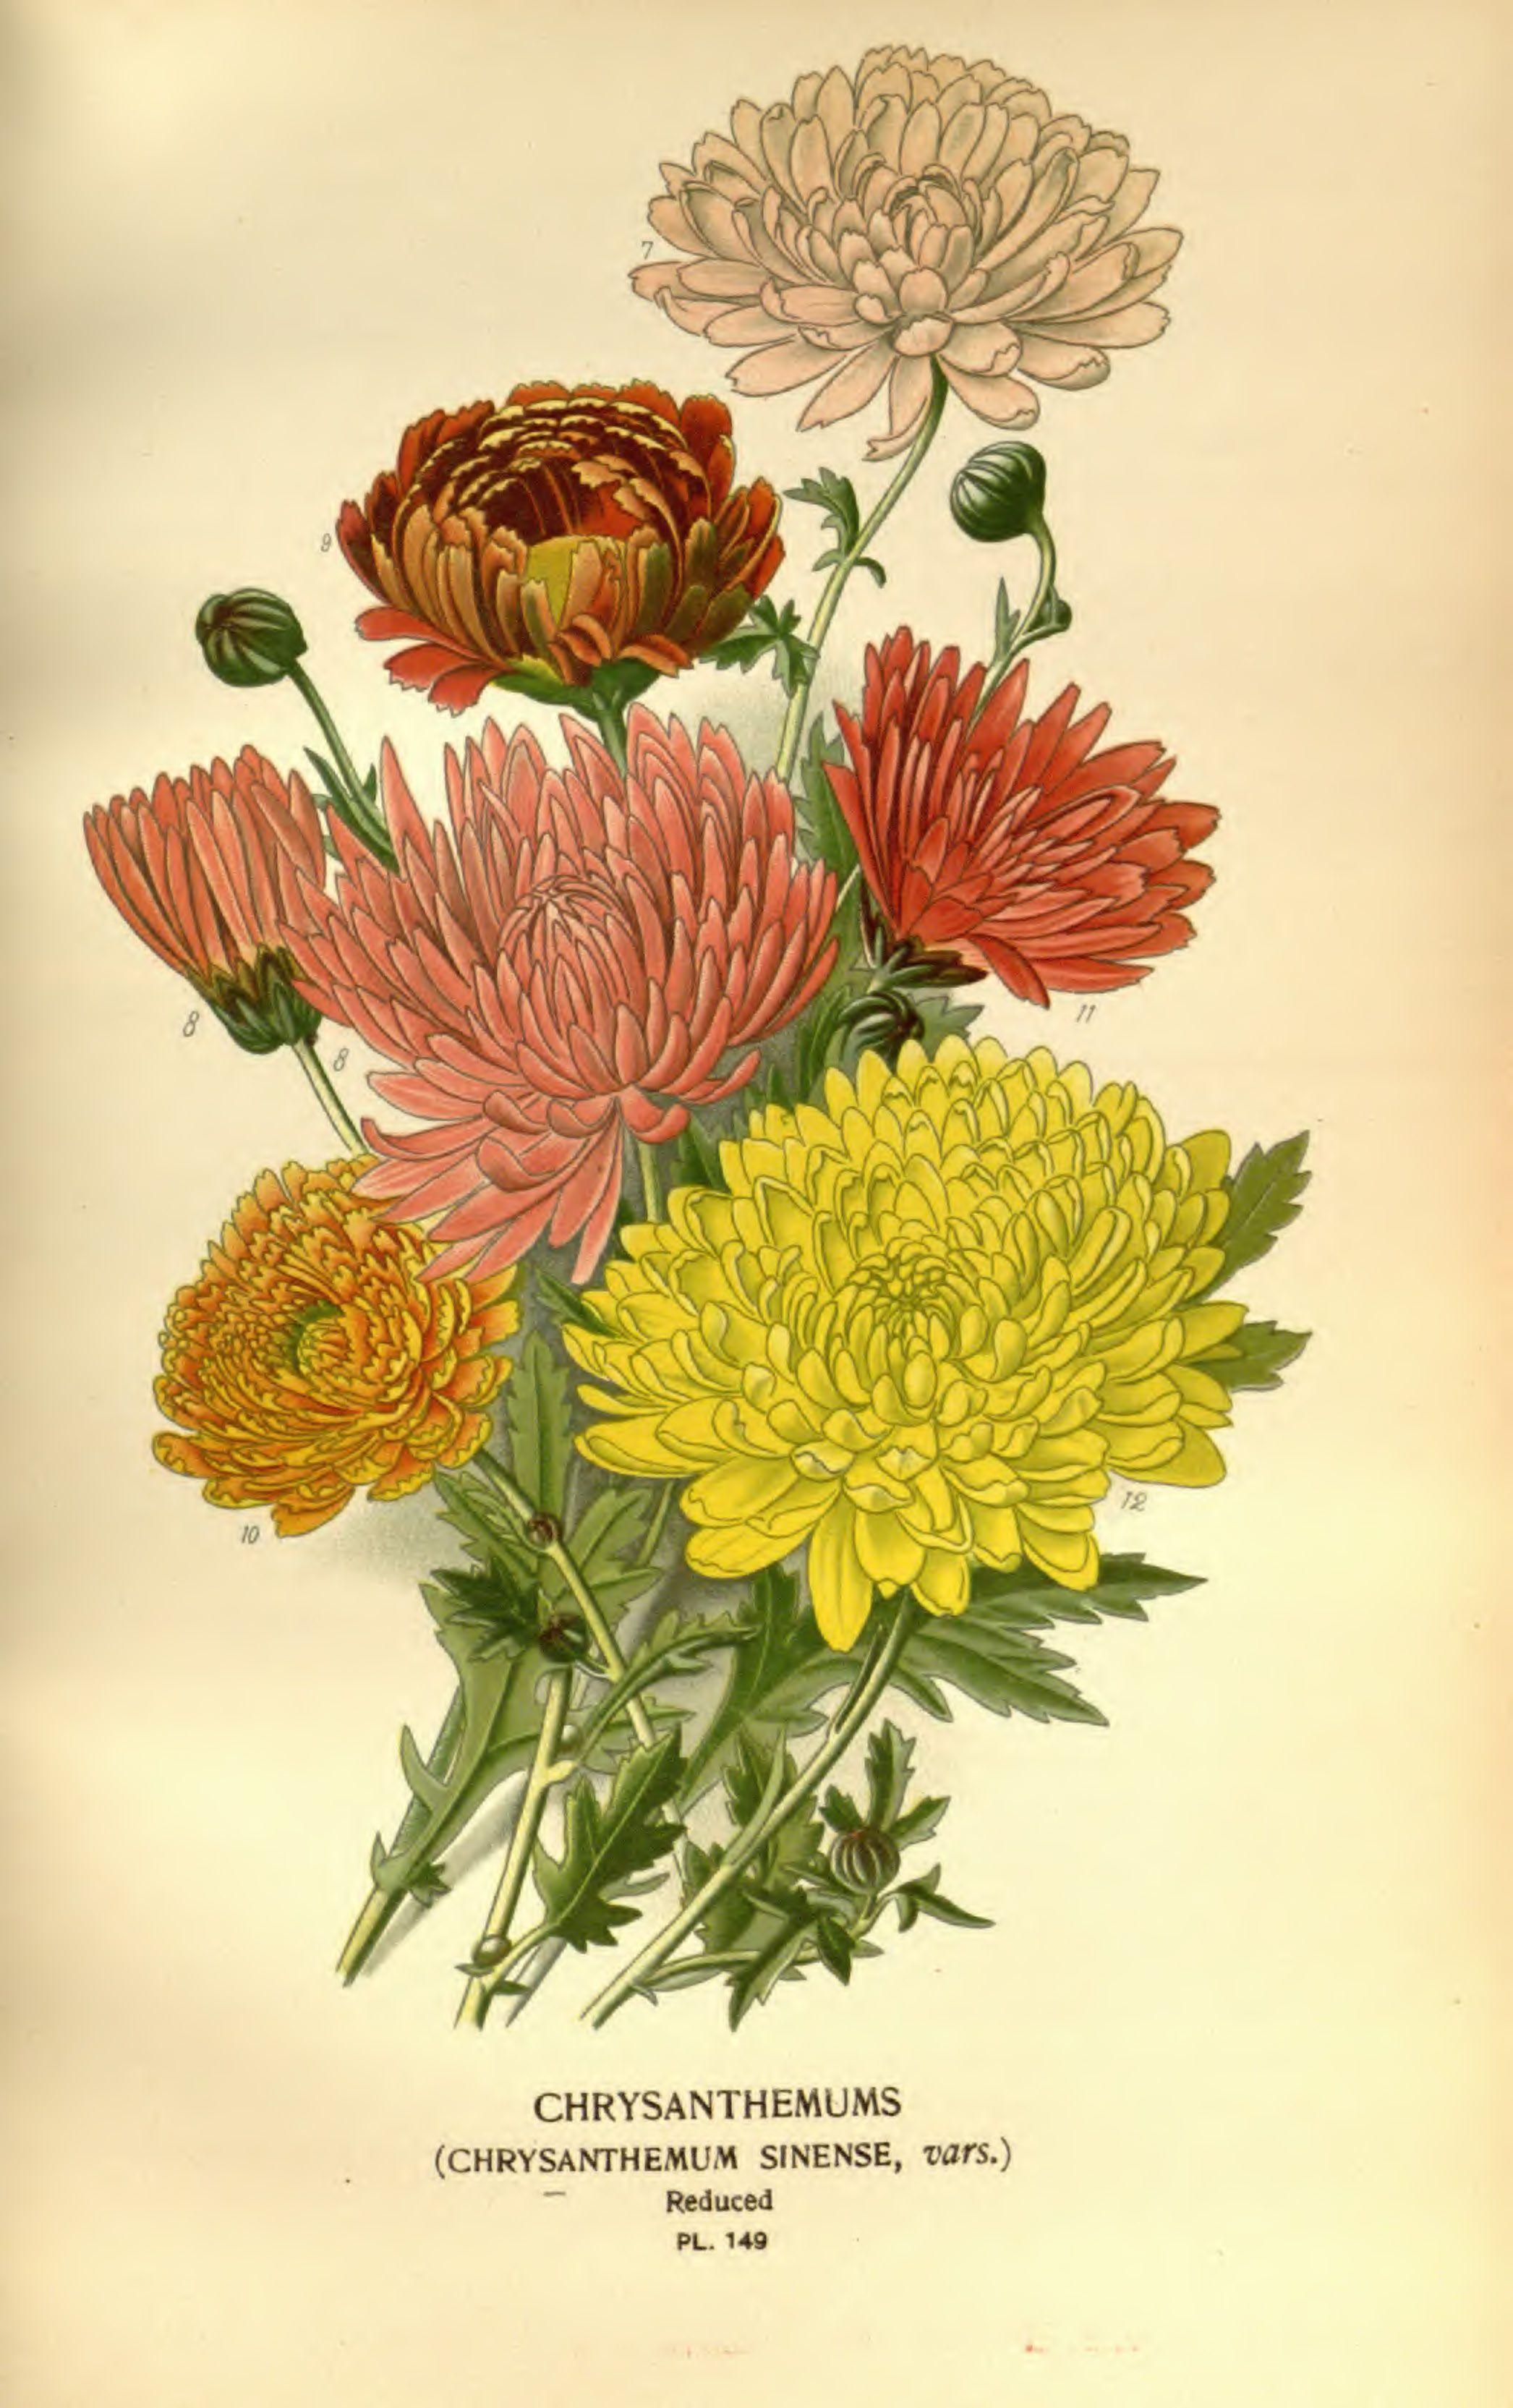 Chrysanthemum 148 Illustration Favourite Flowers Of Garden And Greenhouse V02 Edward Step 1896 Botanical Painting Vintage Botanical Prints Flower Drawing